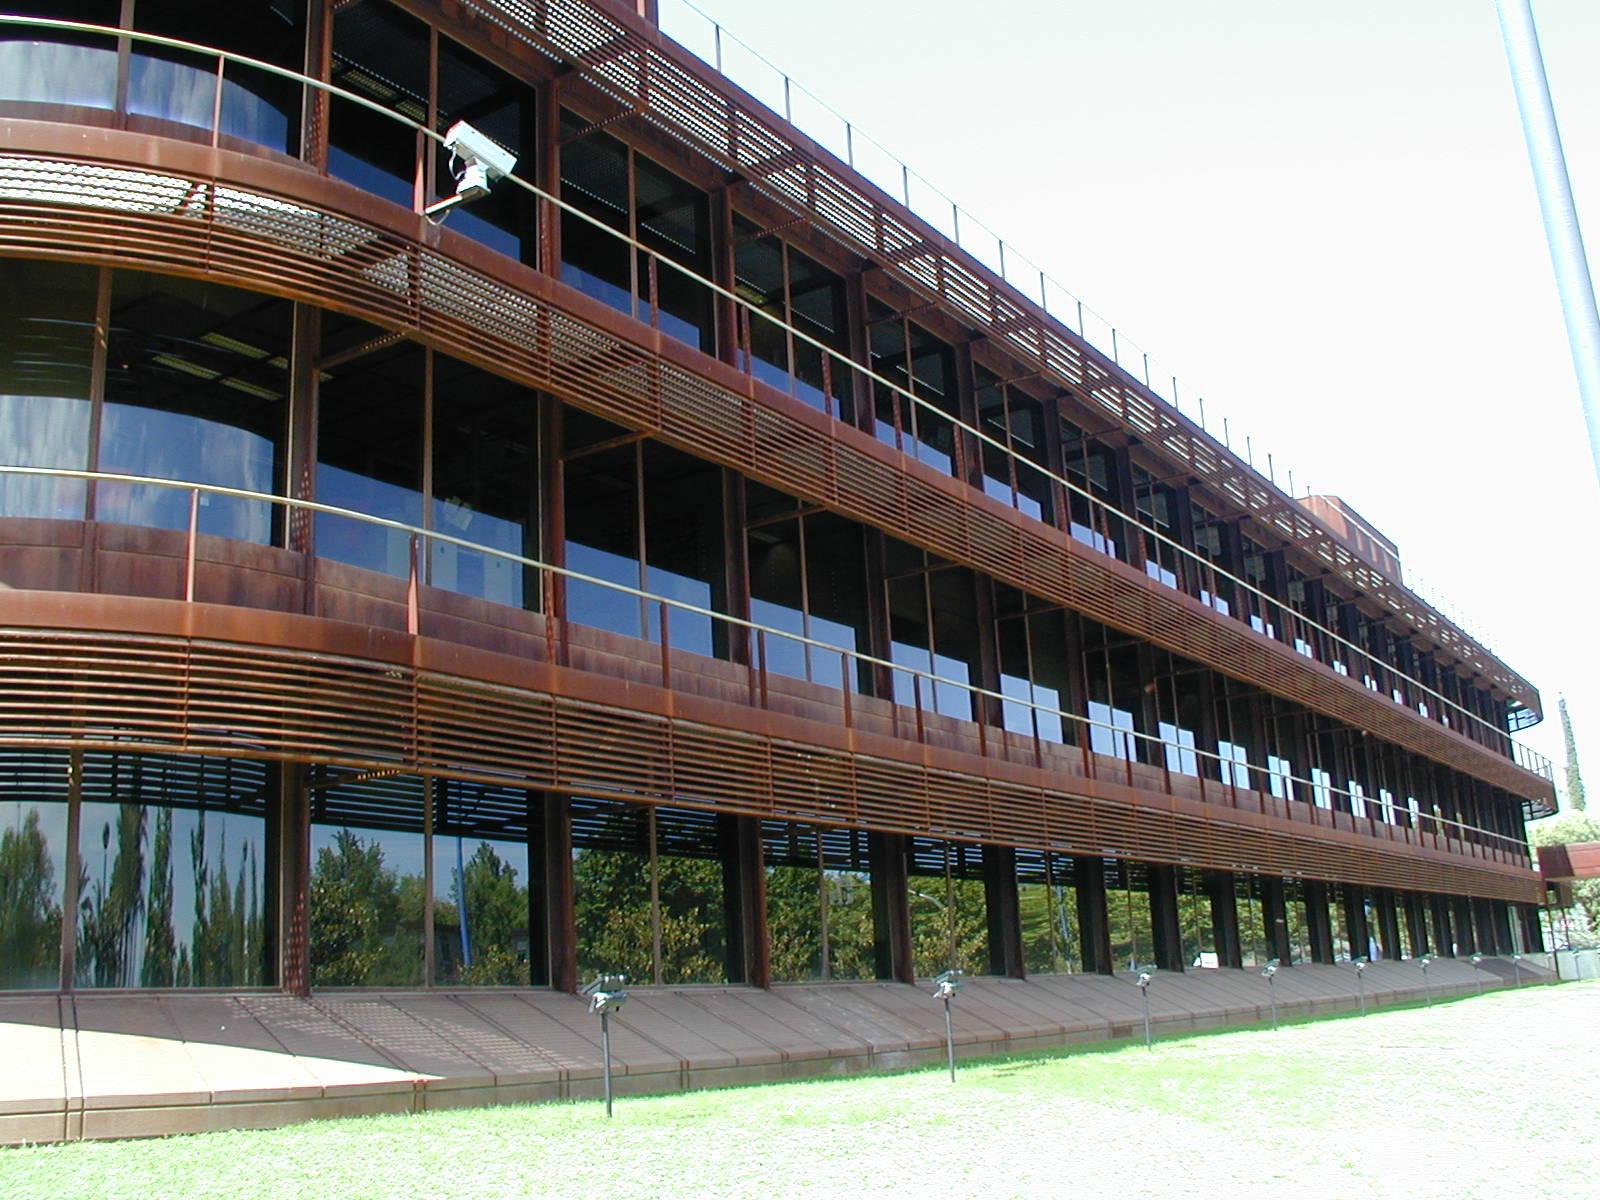 edificio world trade center sevilla cristaleria y aluminios guzman